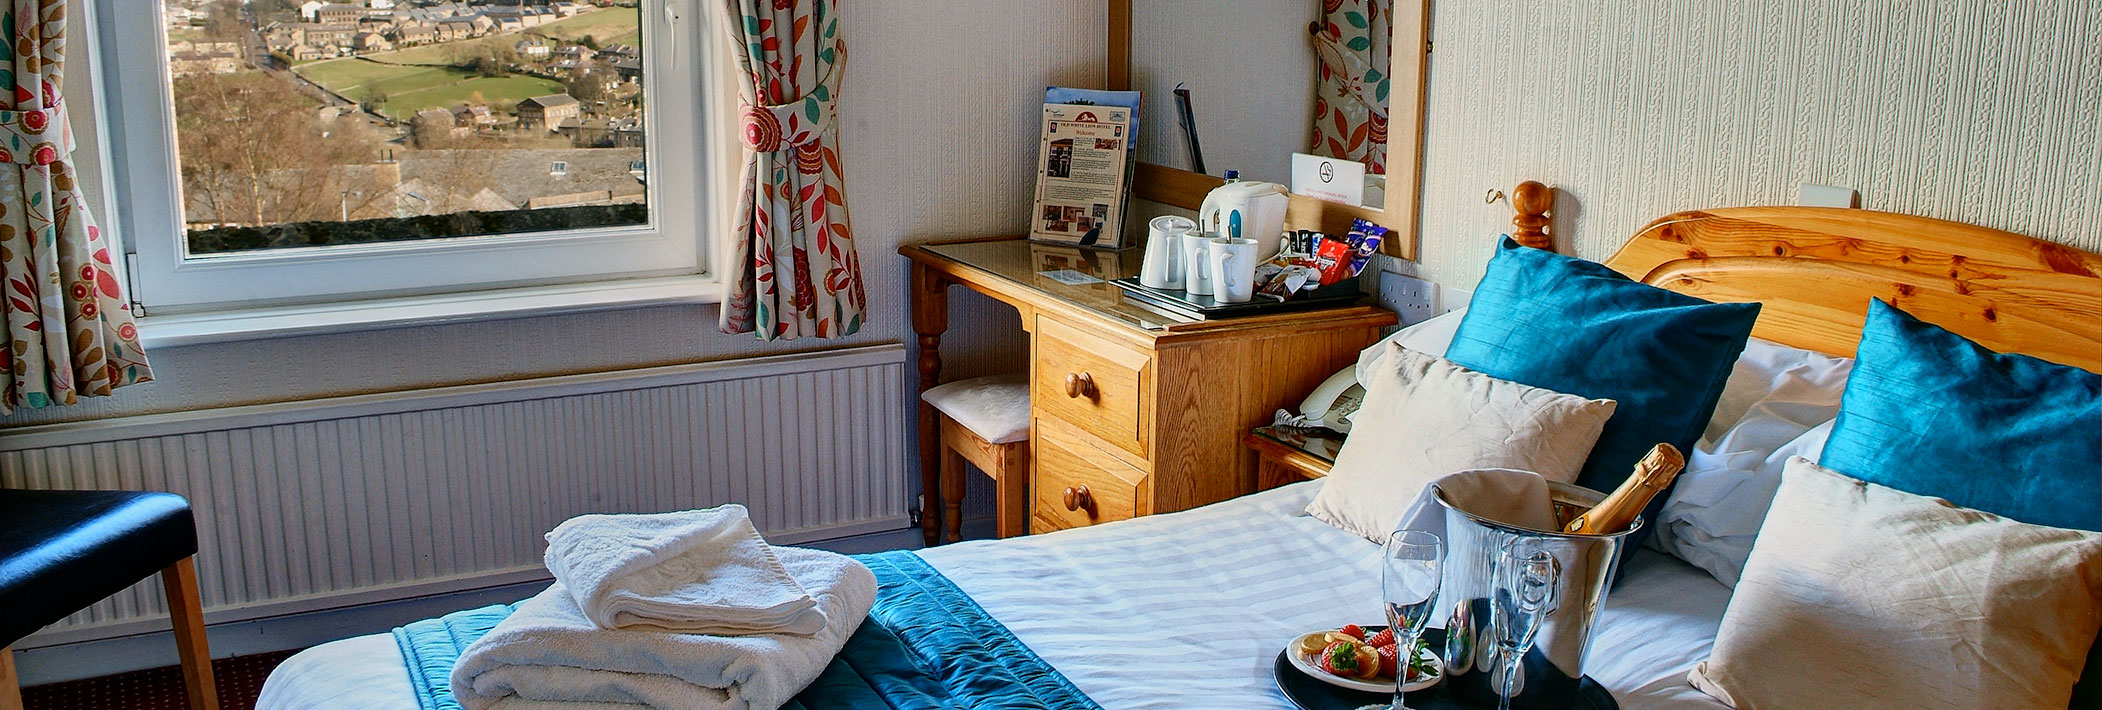 slider-accommodation-haworth